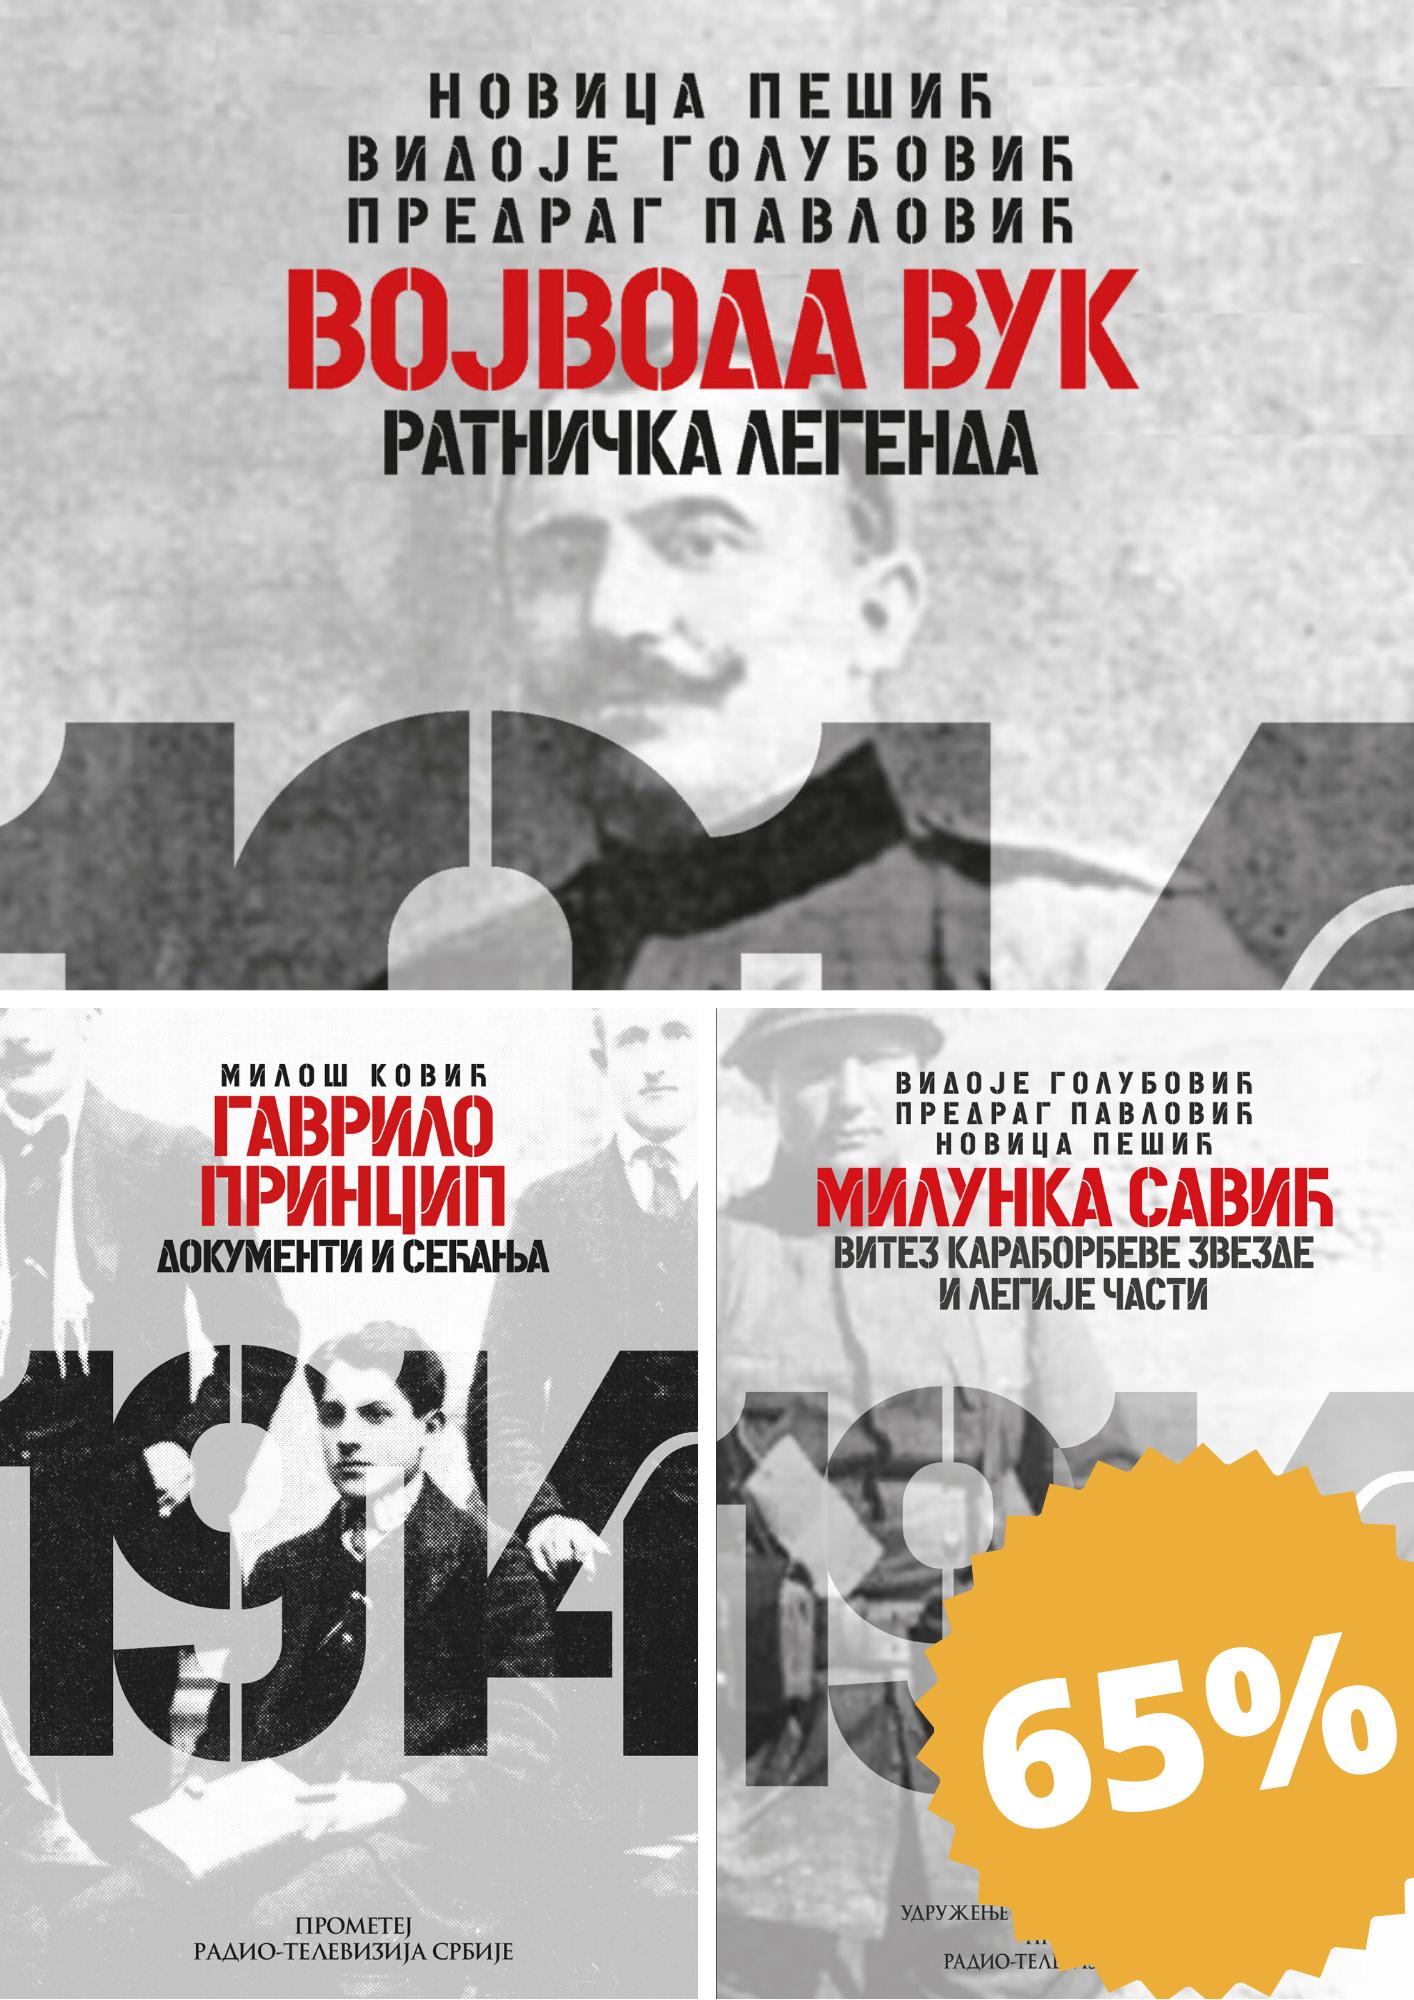 Heroji Velikog rata – komplet od 3 knjige